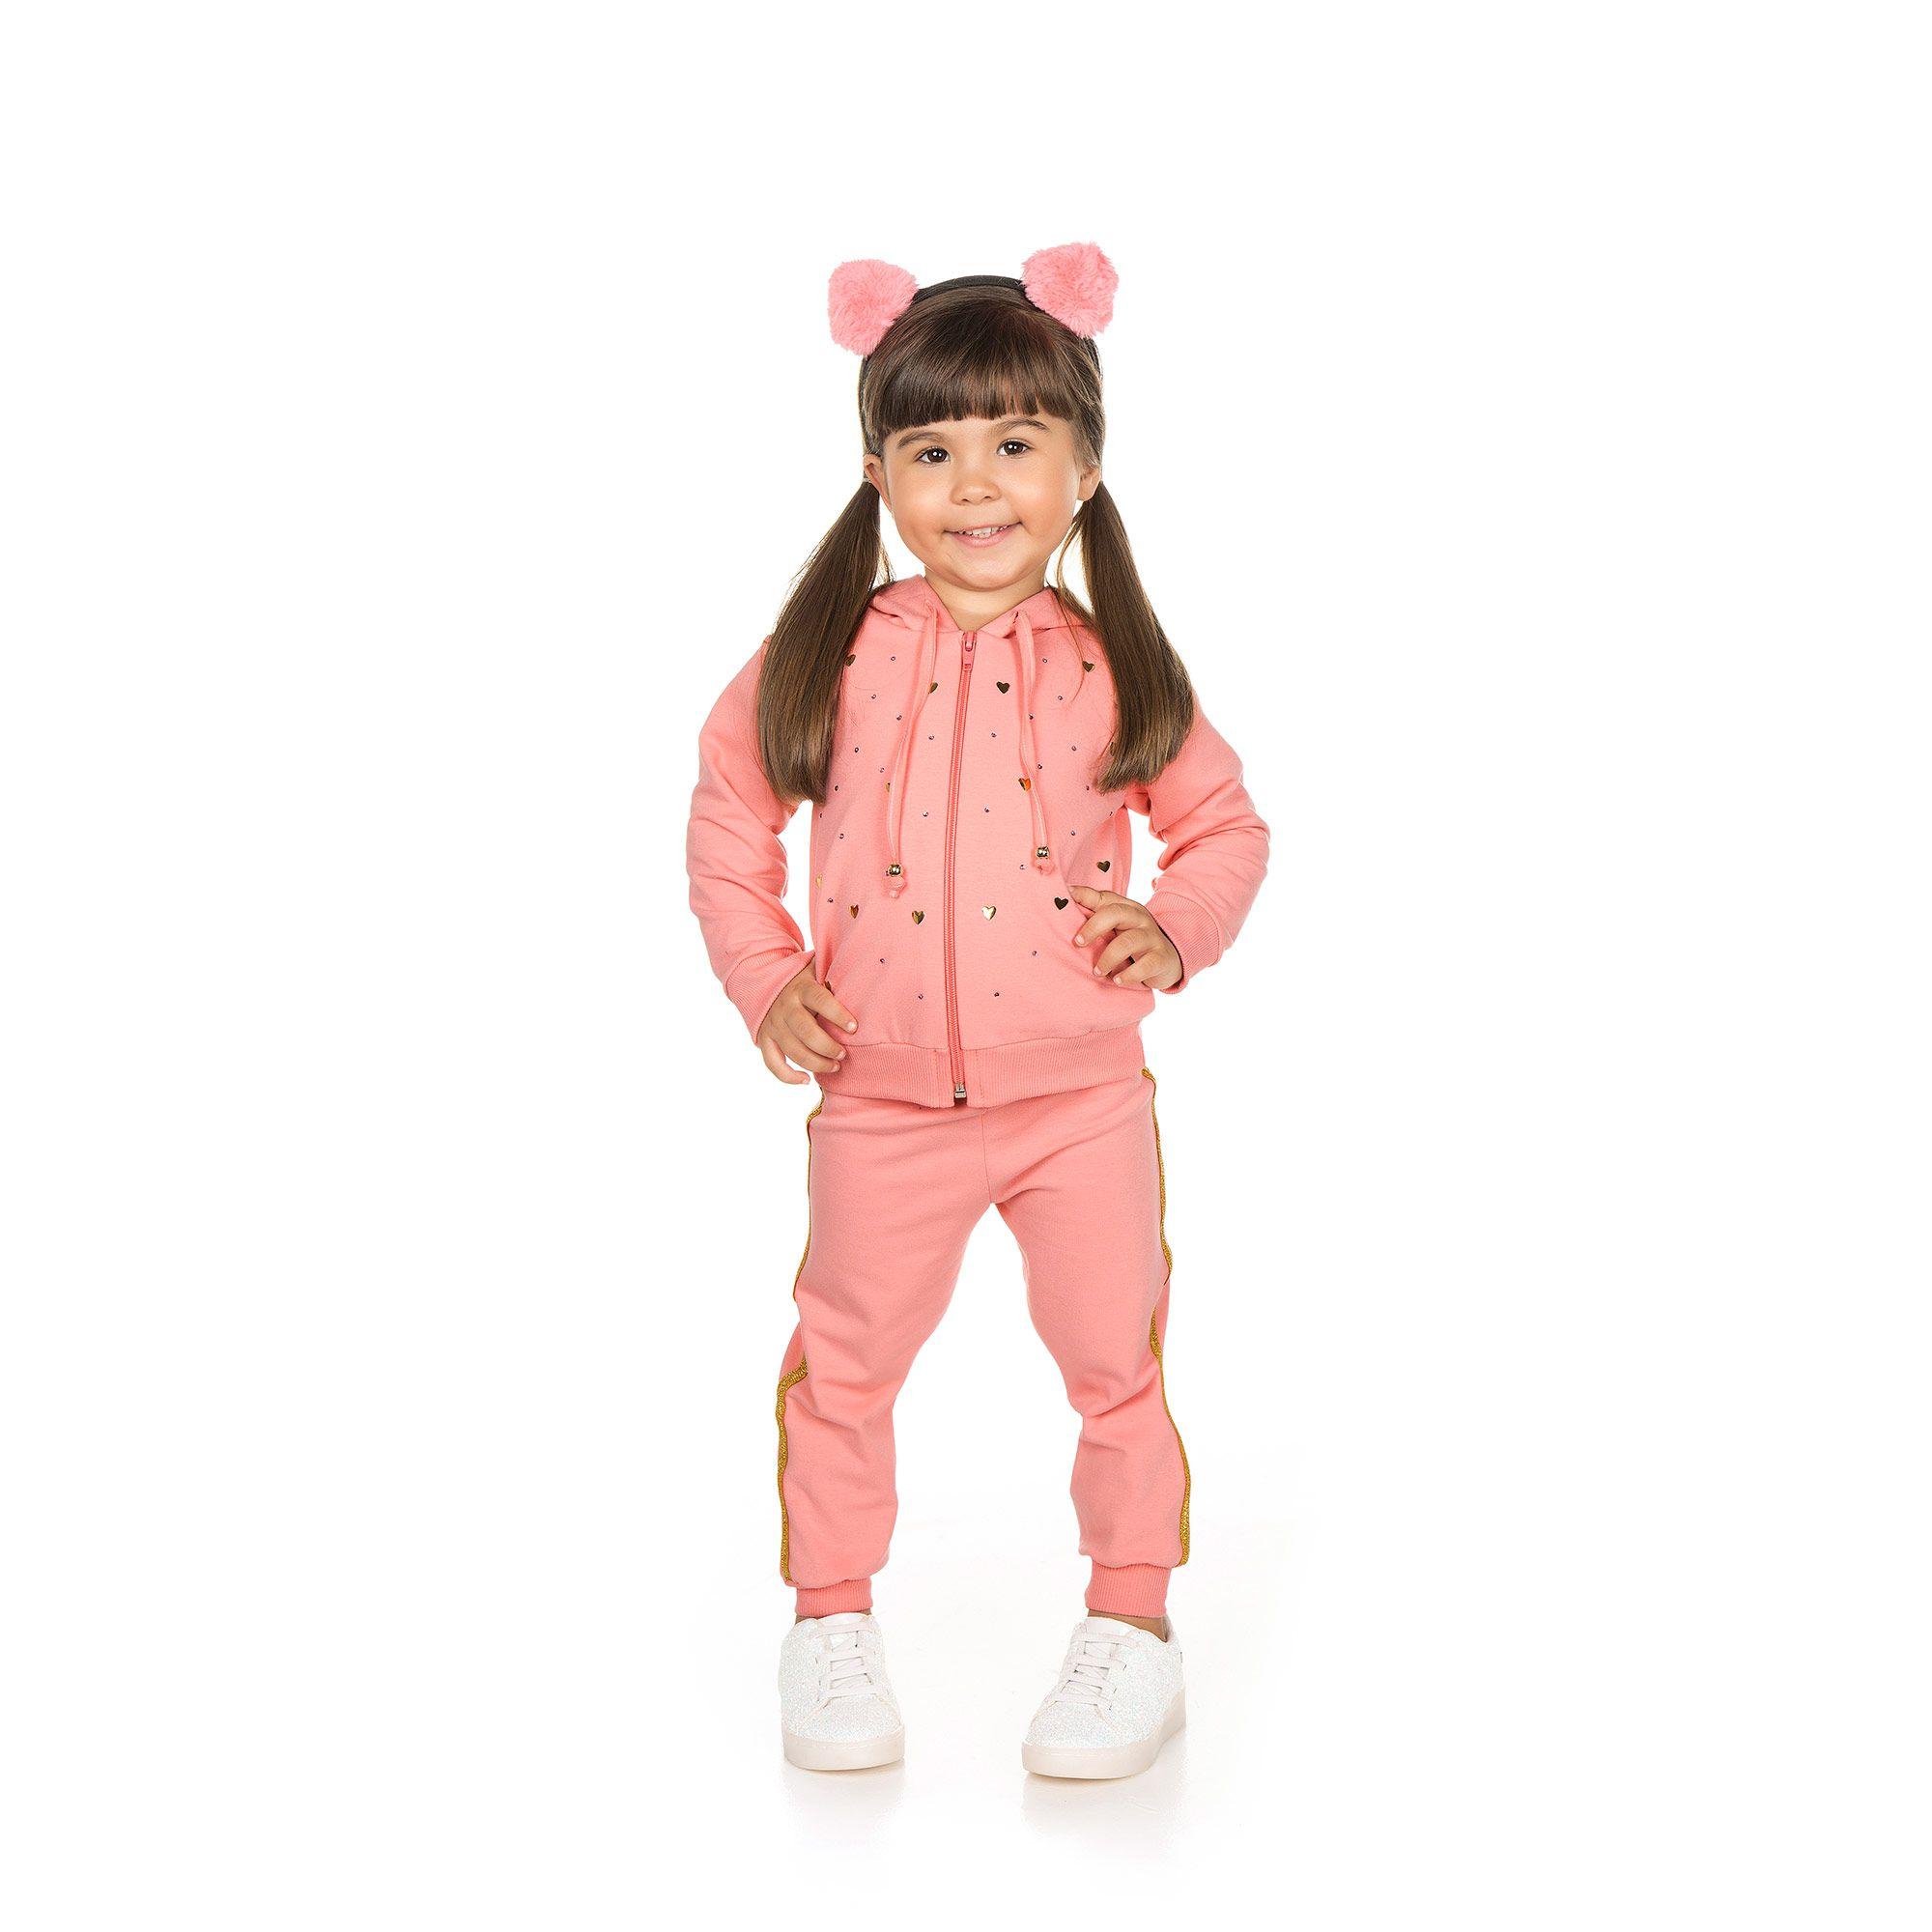 Conjunto Jaqueta Infantil 2 peças - Ref 4960 - Tutti Frutti